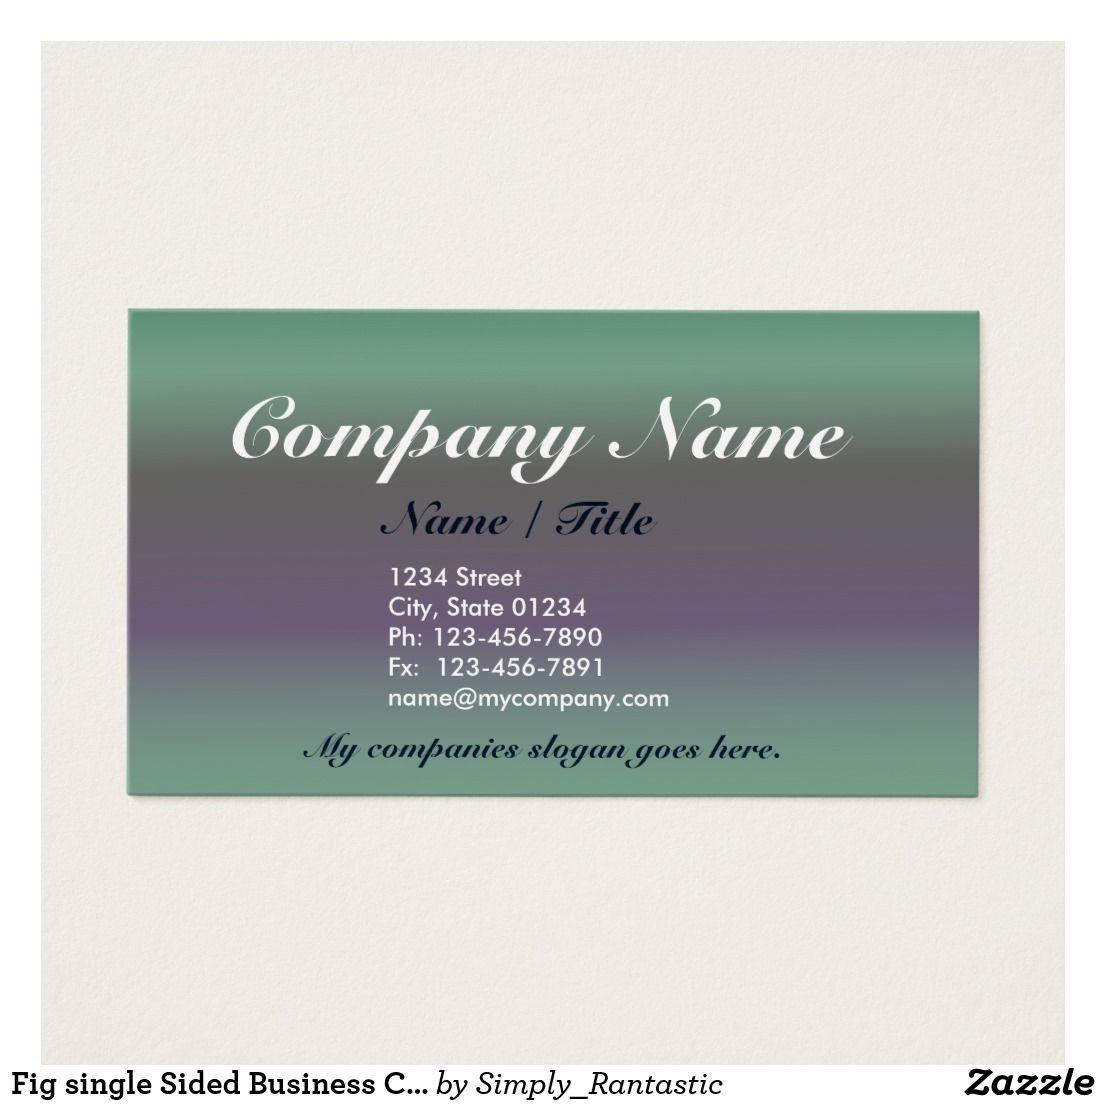 Fig single sided business card template v3 business cards and card fig single sided business card template v3 colourmoves